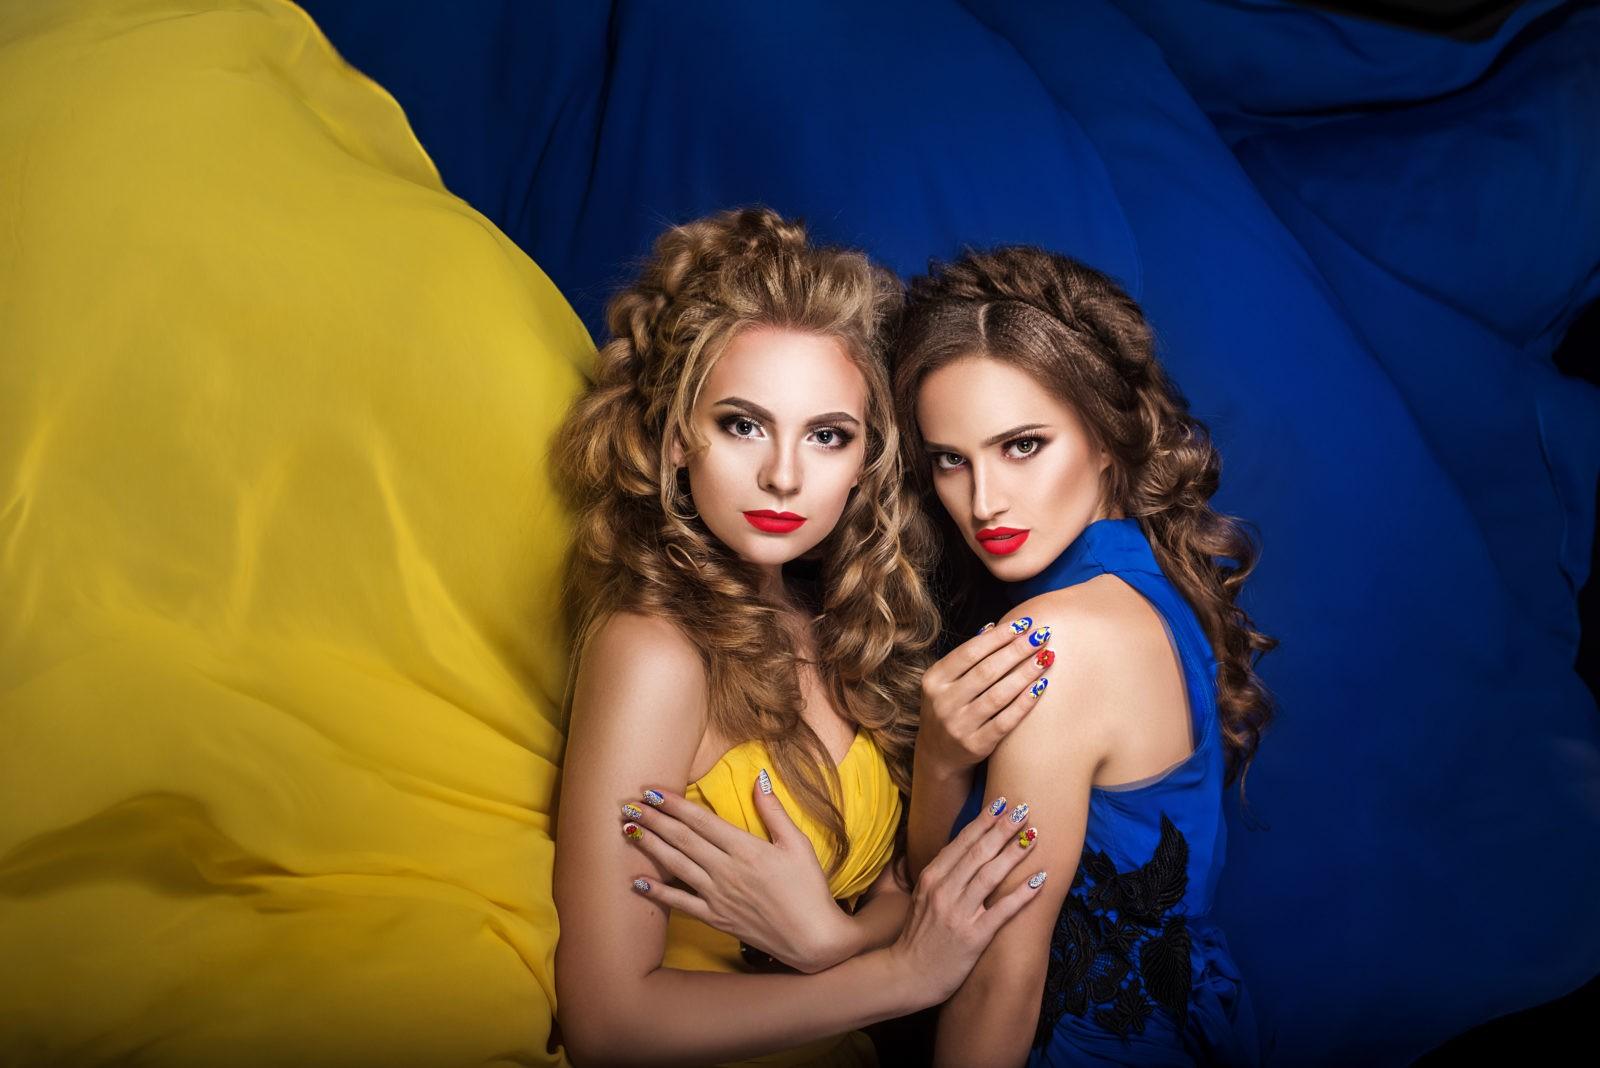 2 ukrainiennes typiques